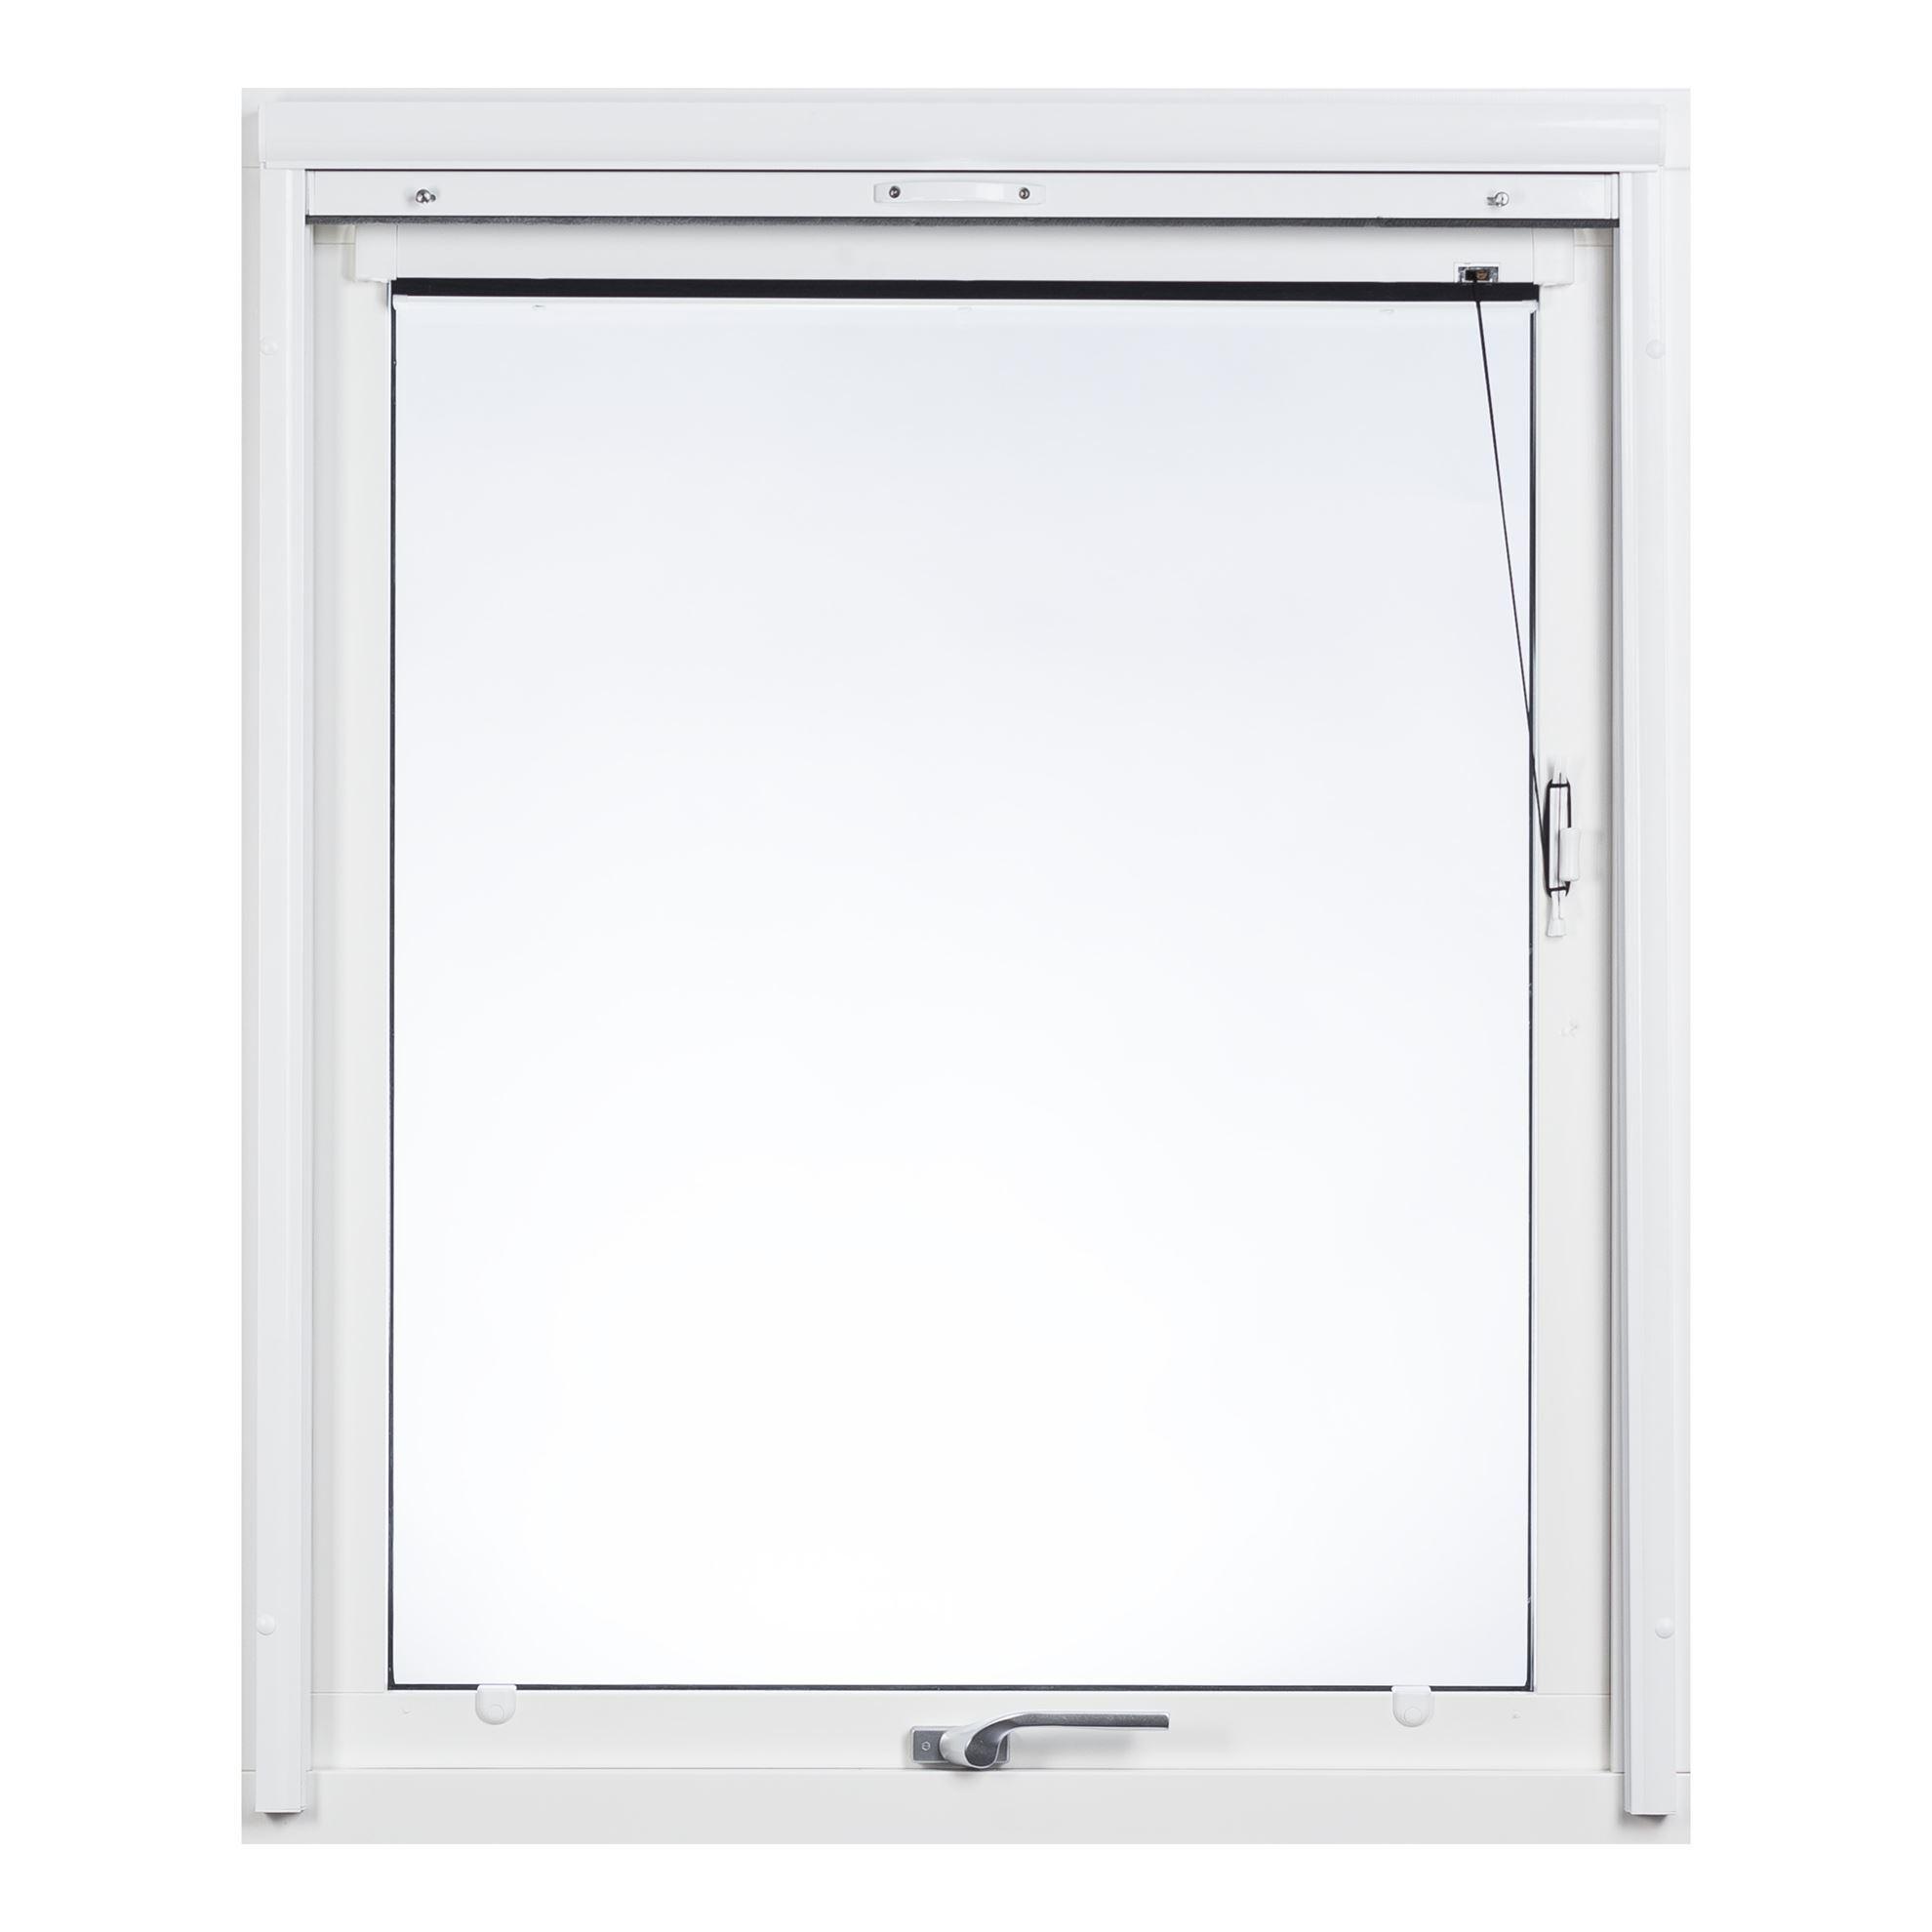 Unika Myggnät till fönster-Outline Webbshop QW-97